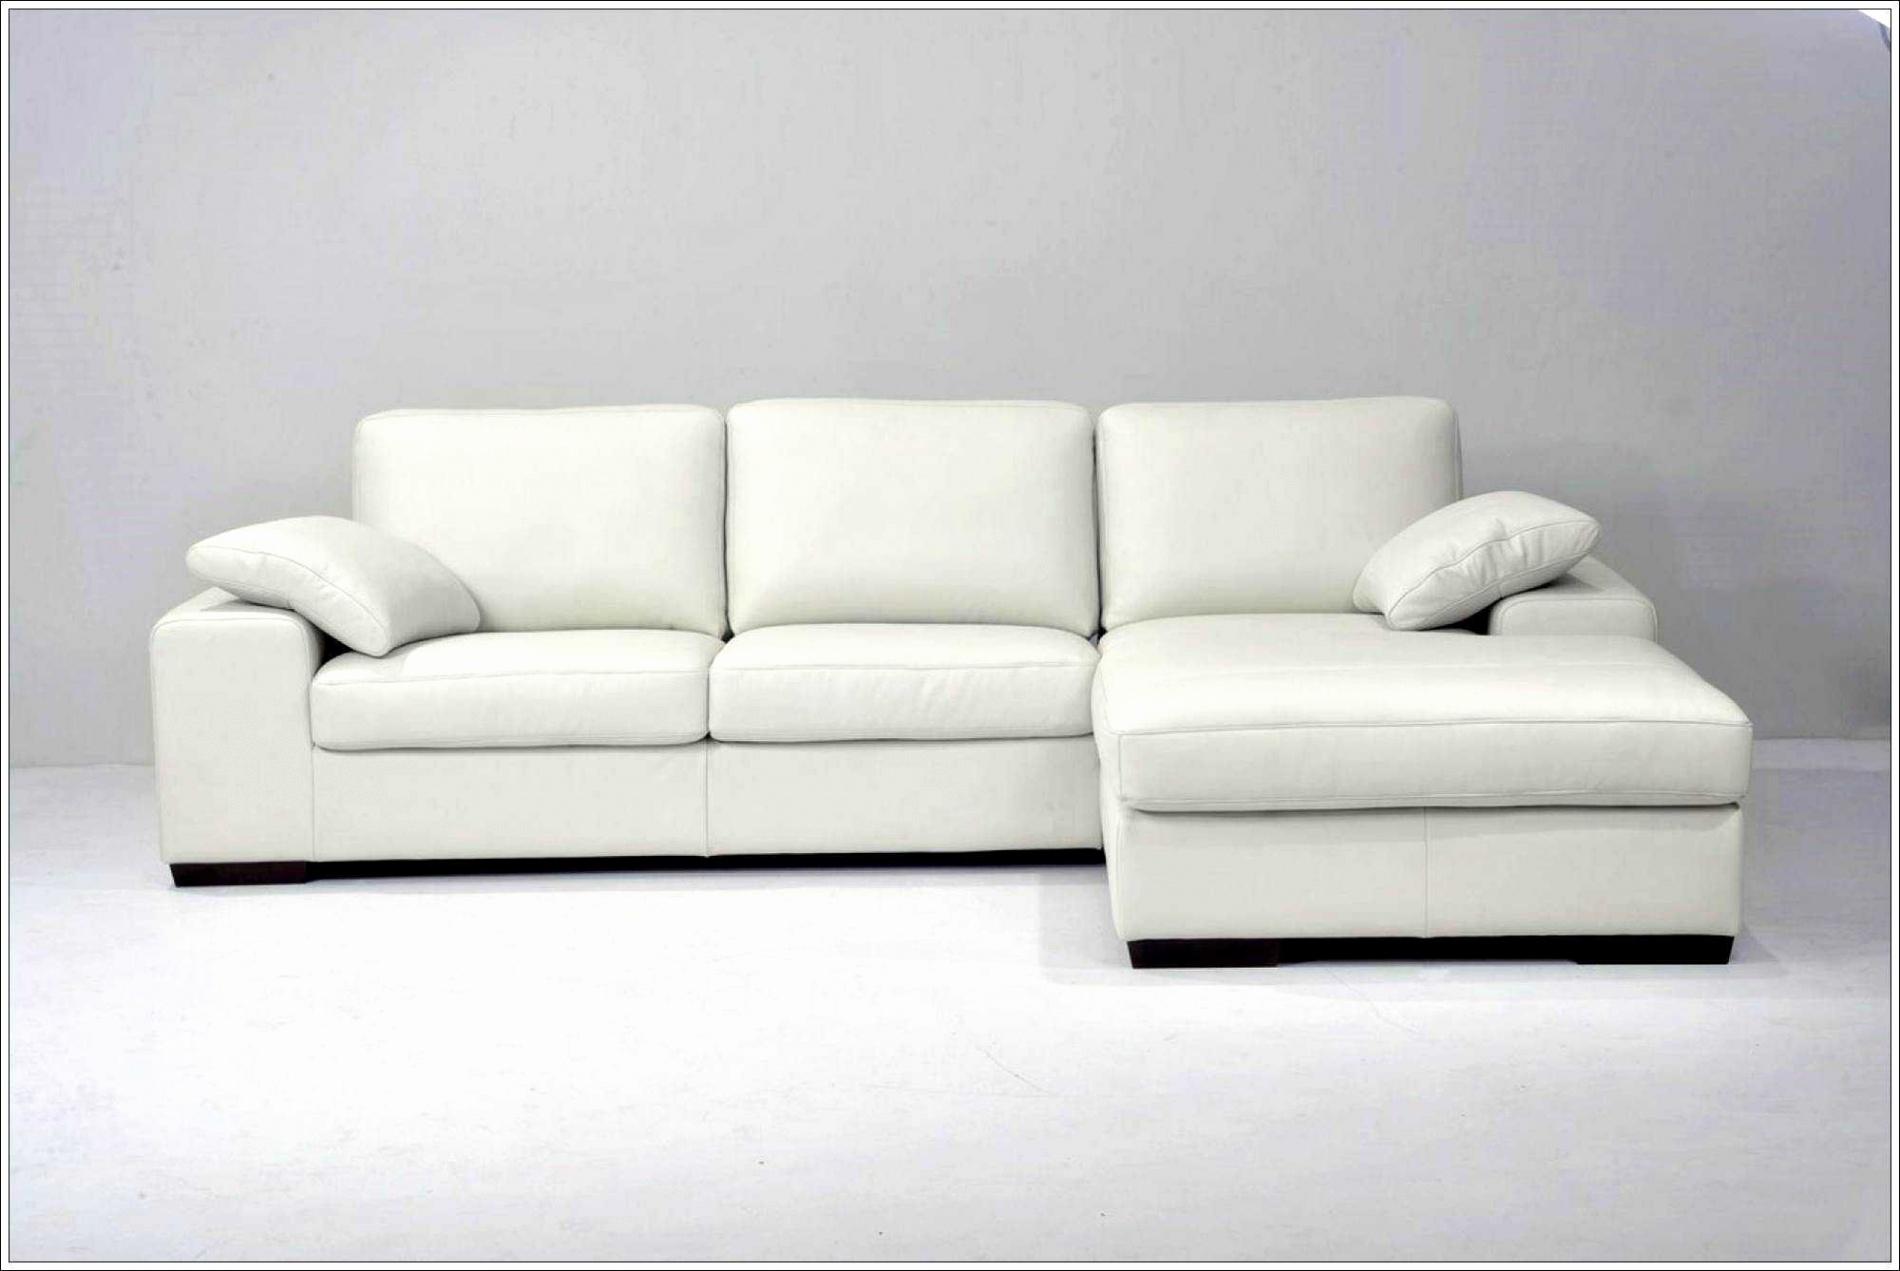 Canapé Ikea Convertible 2 Places 38 inspirant alinea canape 2 places   salon jardin